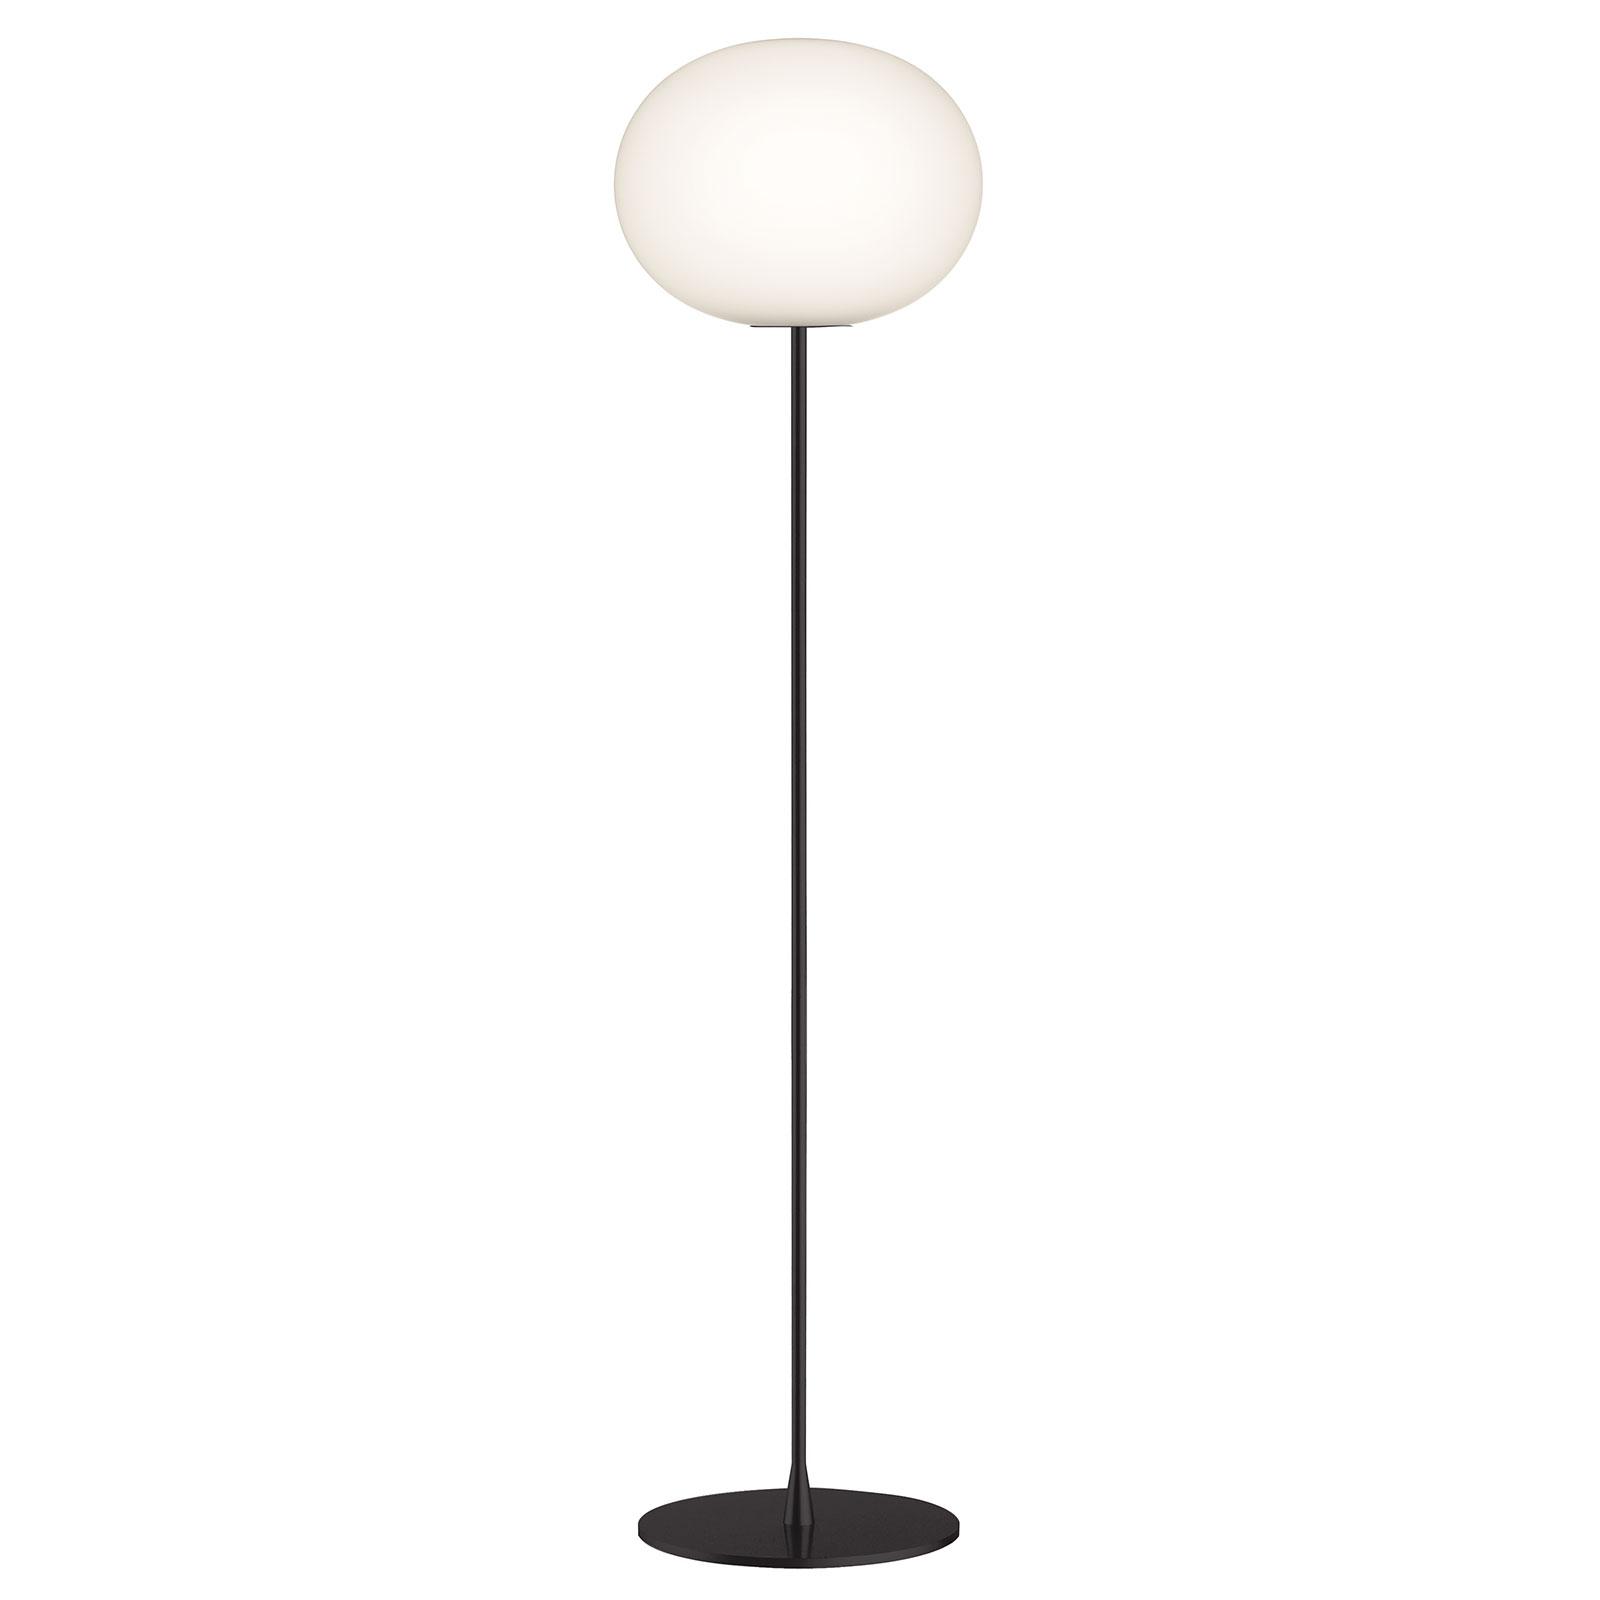 FLOS Glo-Ball F3 vloerlamp, zwart